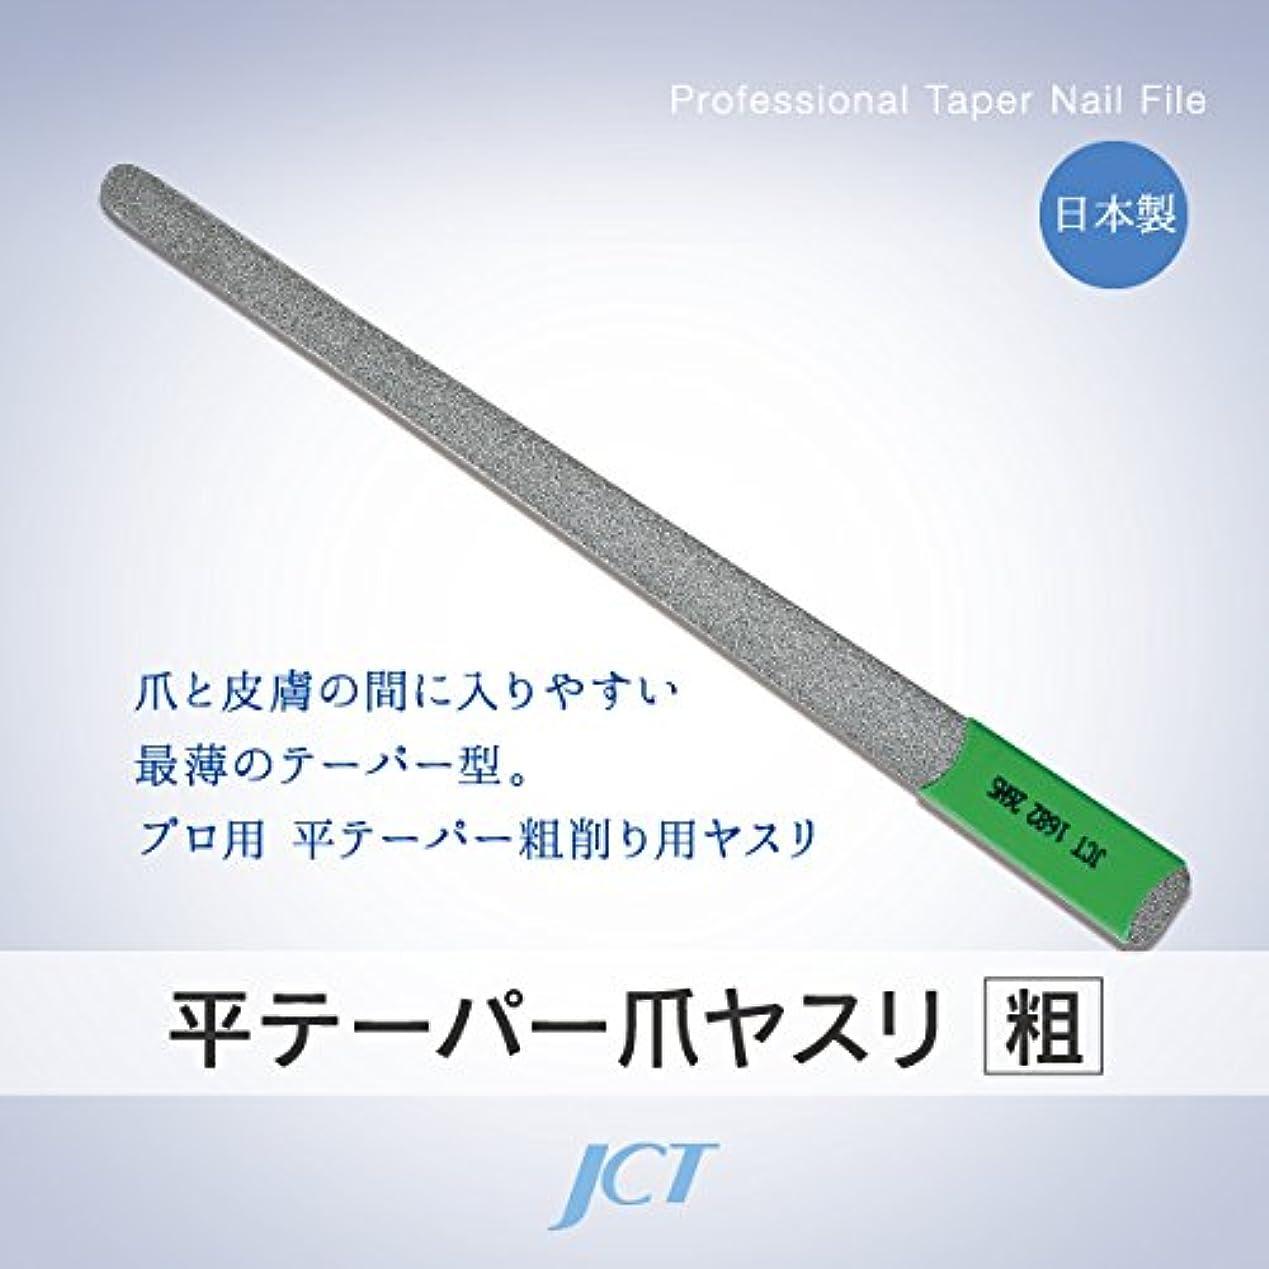 JCT メディカル フットケア ダイヤモンド平テーパー爪ヤスリ(粗) 滅菌可 日本製 1年間保証付